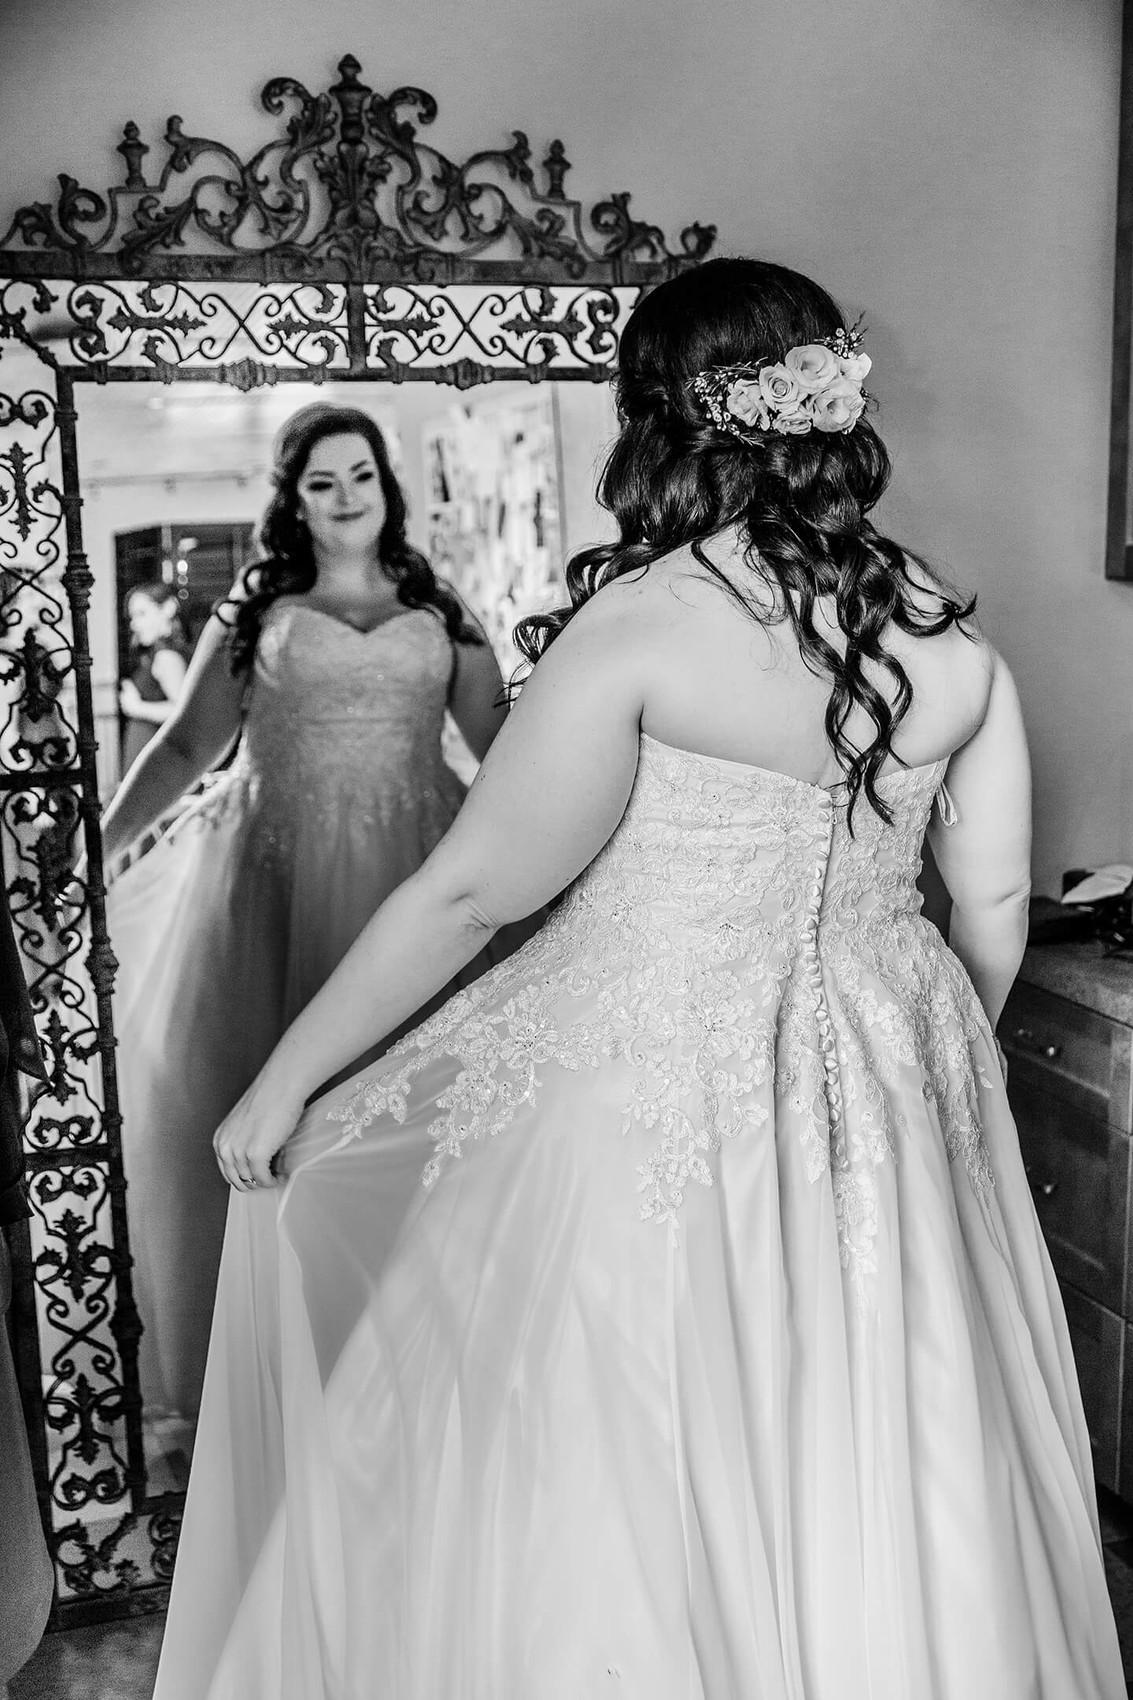 Bride at The Marmalade Lily